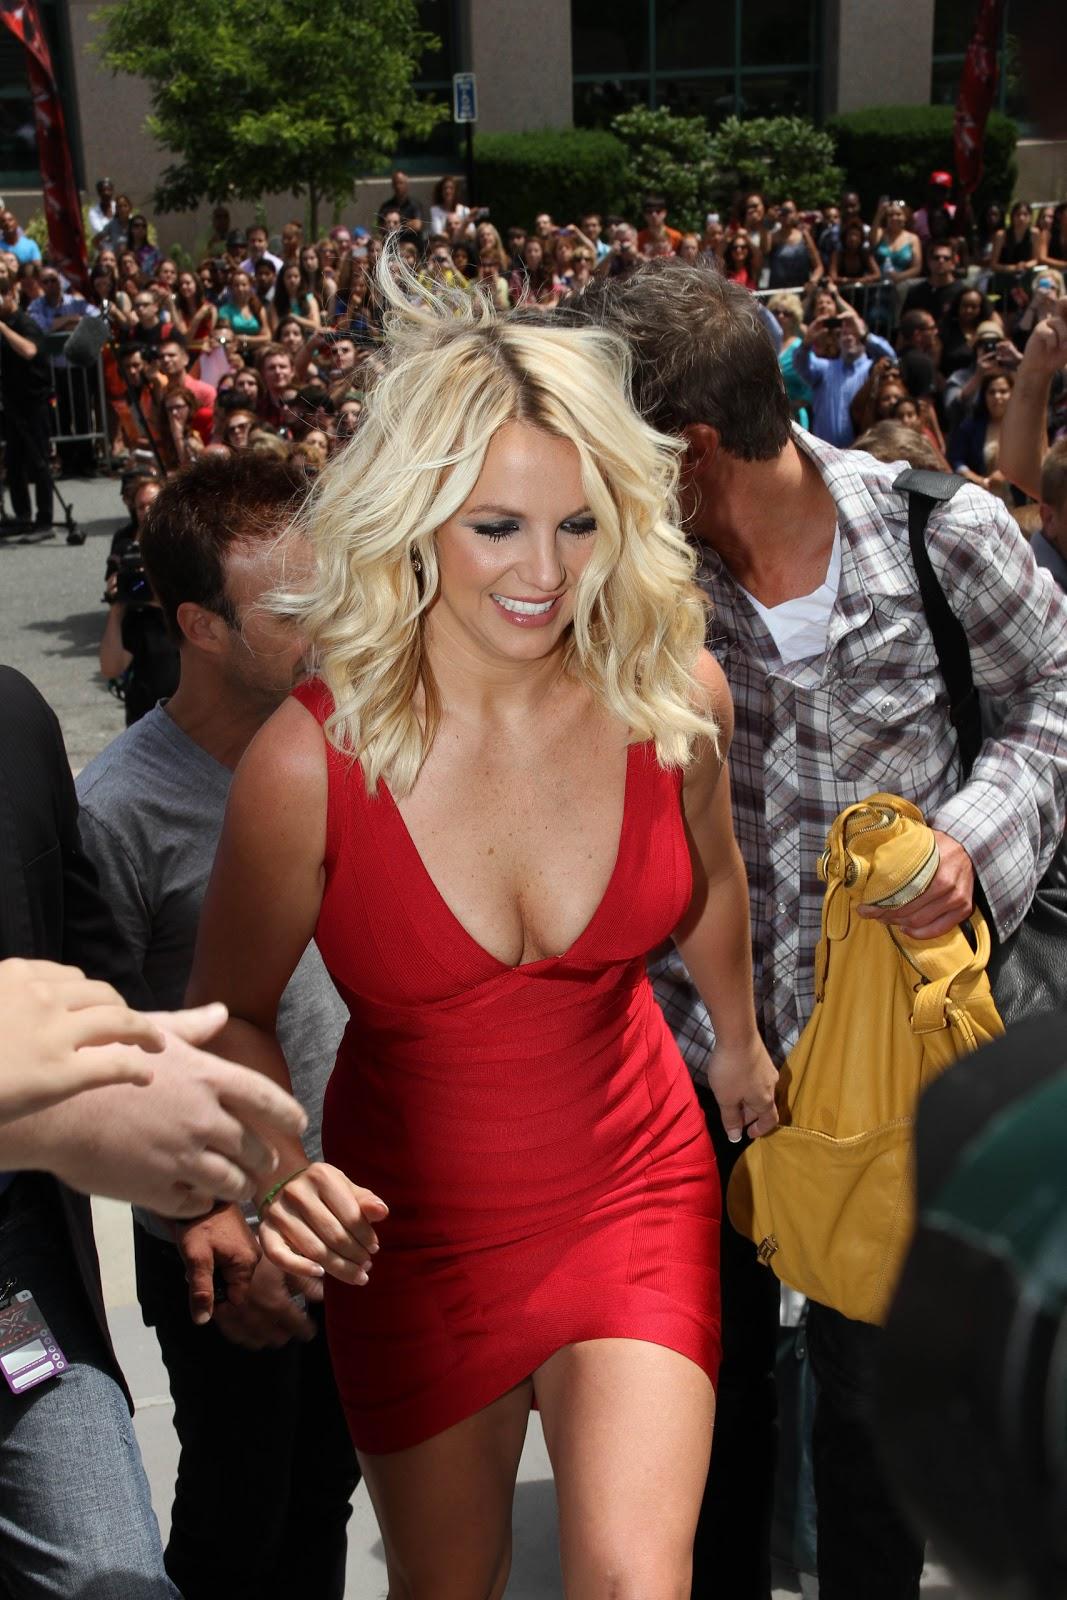 http://2.bp.blogspot.com/-ZkcqJor9Je8/T_WxjhsbyXI/AAAAAAAAE_Y/HIYV1jDe7JY/s1600/953218216_BritneySpears_2012X_Factor_9b_122_68lo.jpg